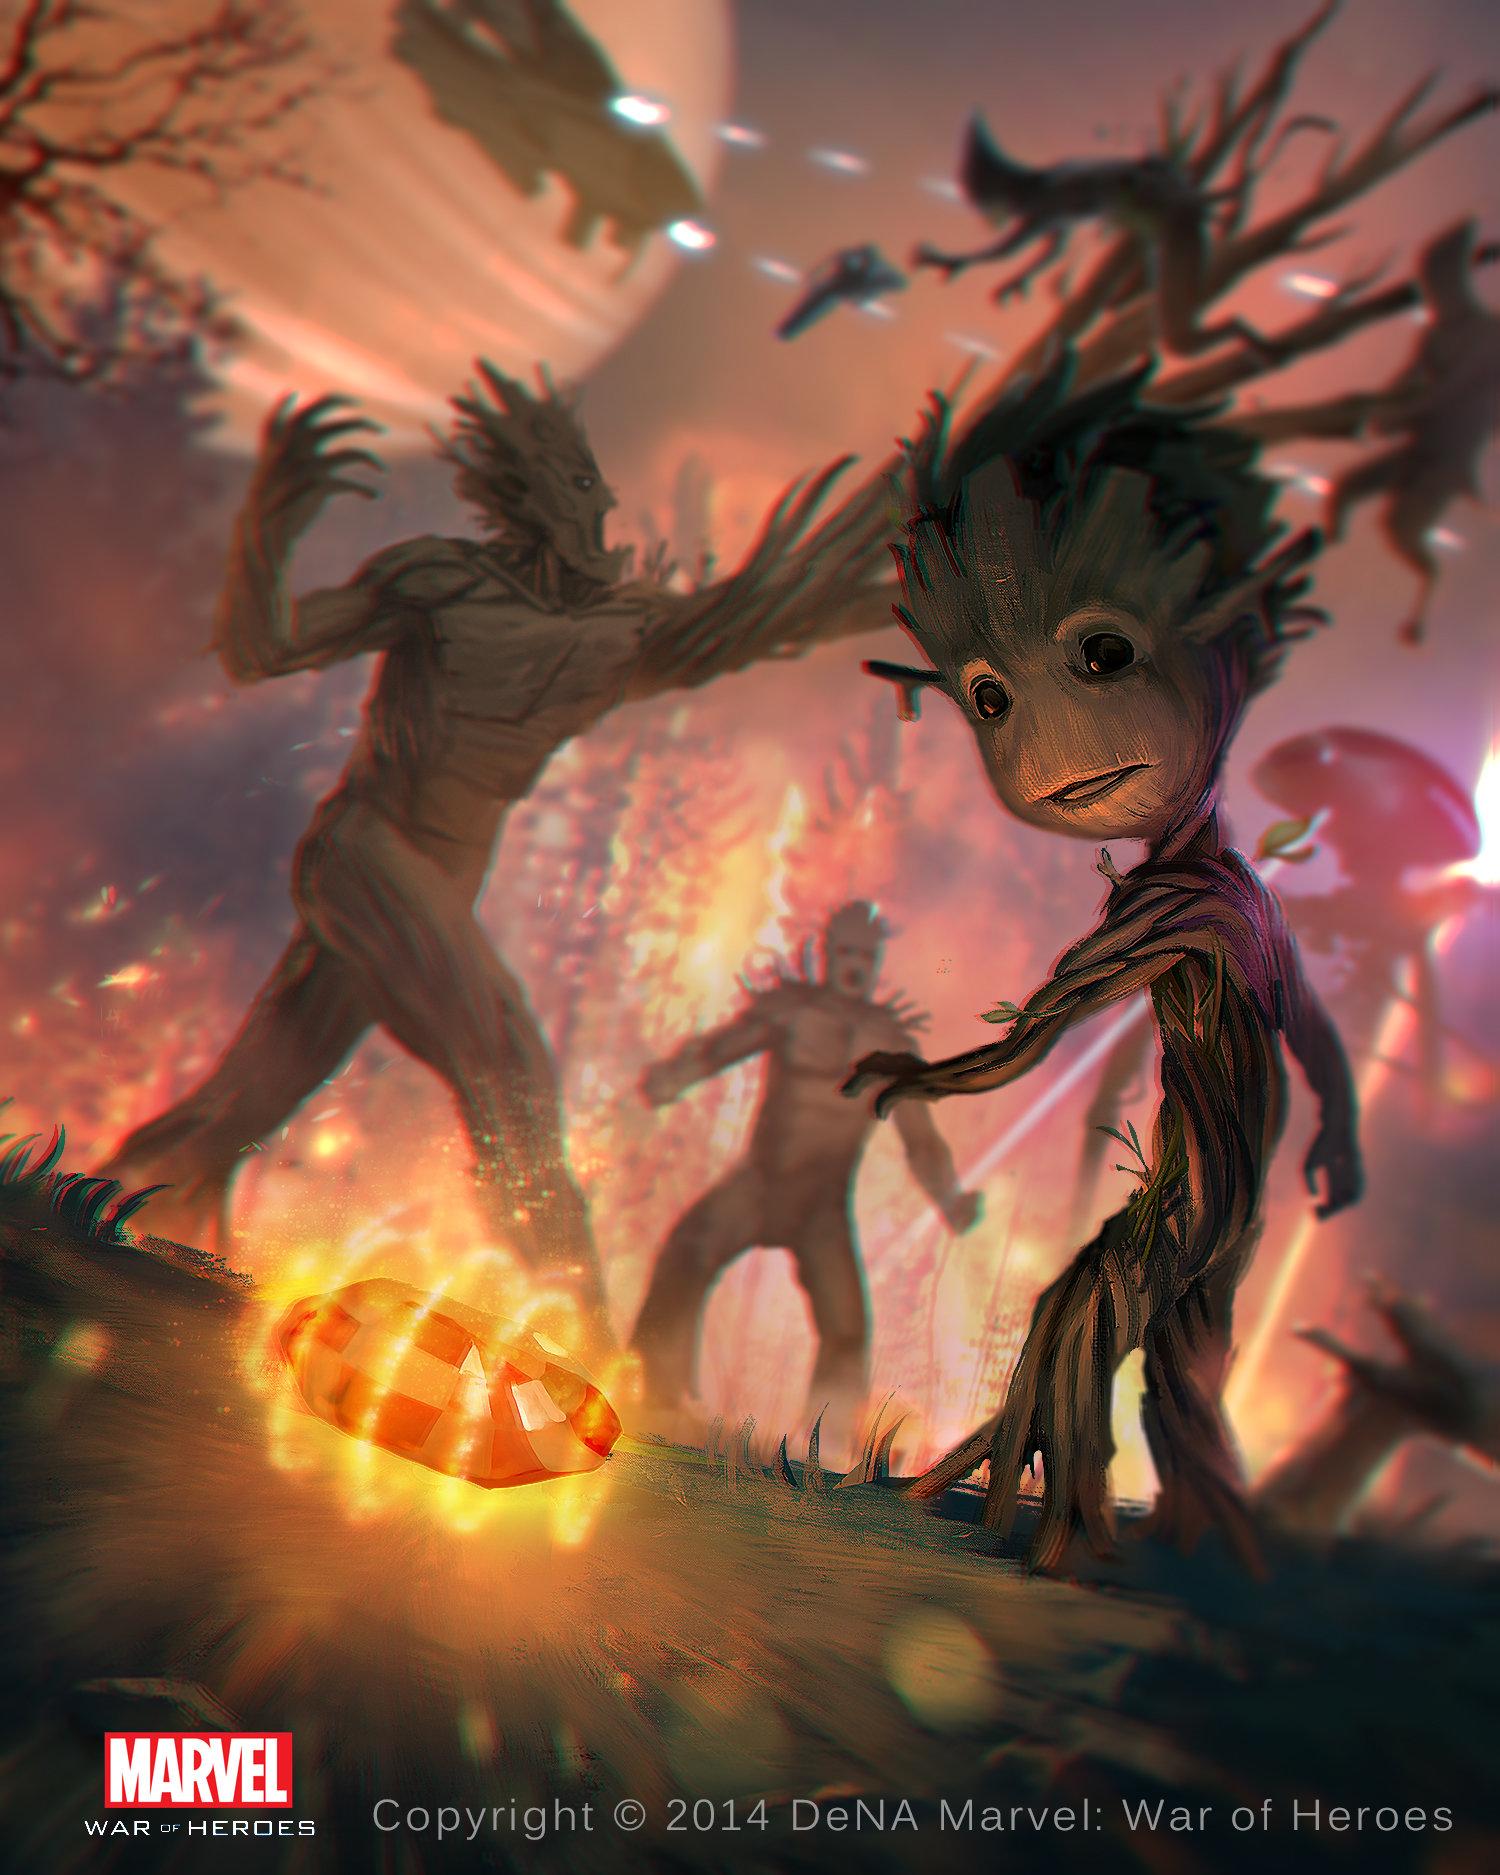 ArtStation - Groot - Marvel War of Heroes, Cuong Le Manh